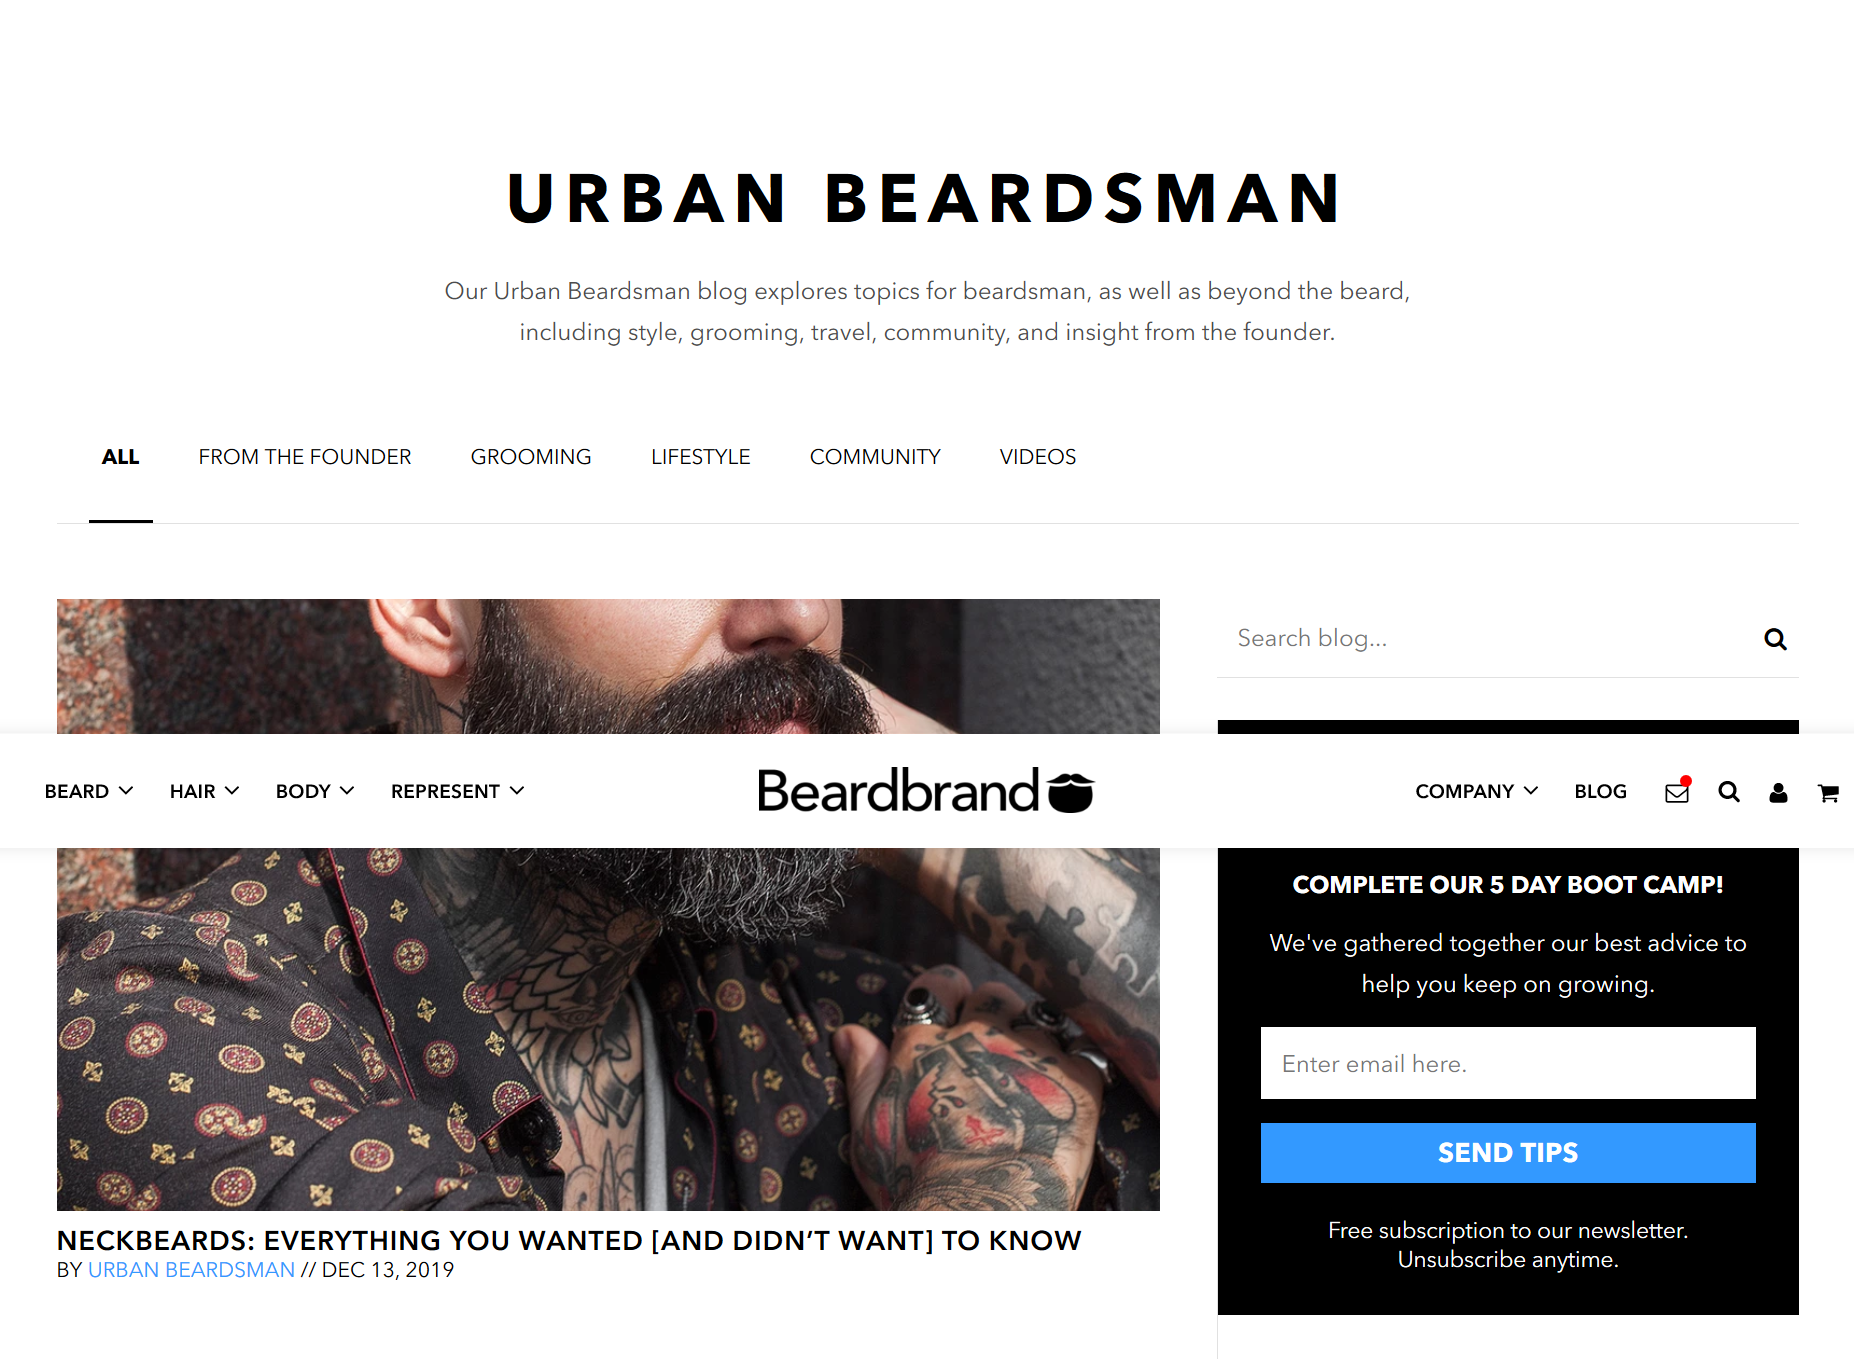 Beardbrand best marketplace marketing strategy